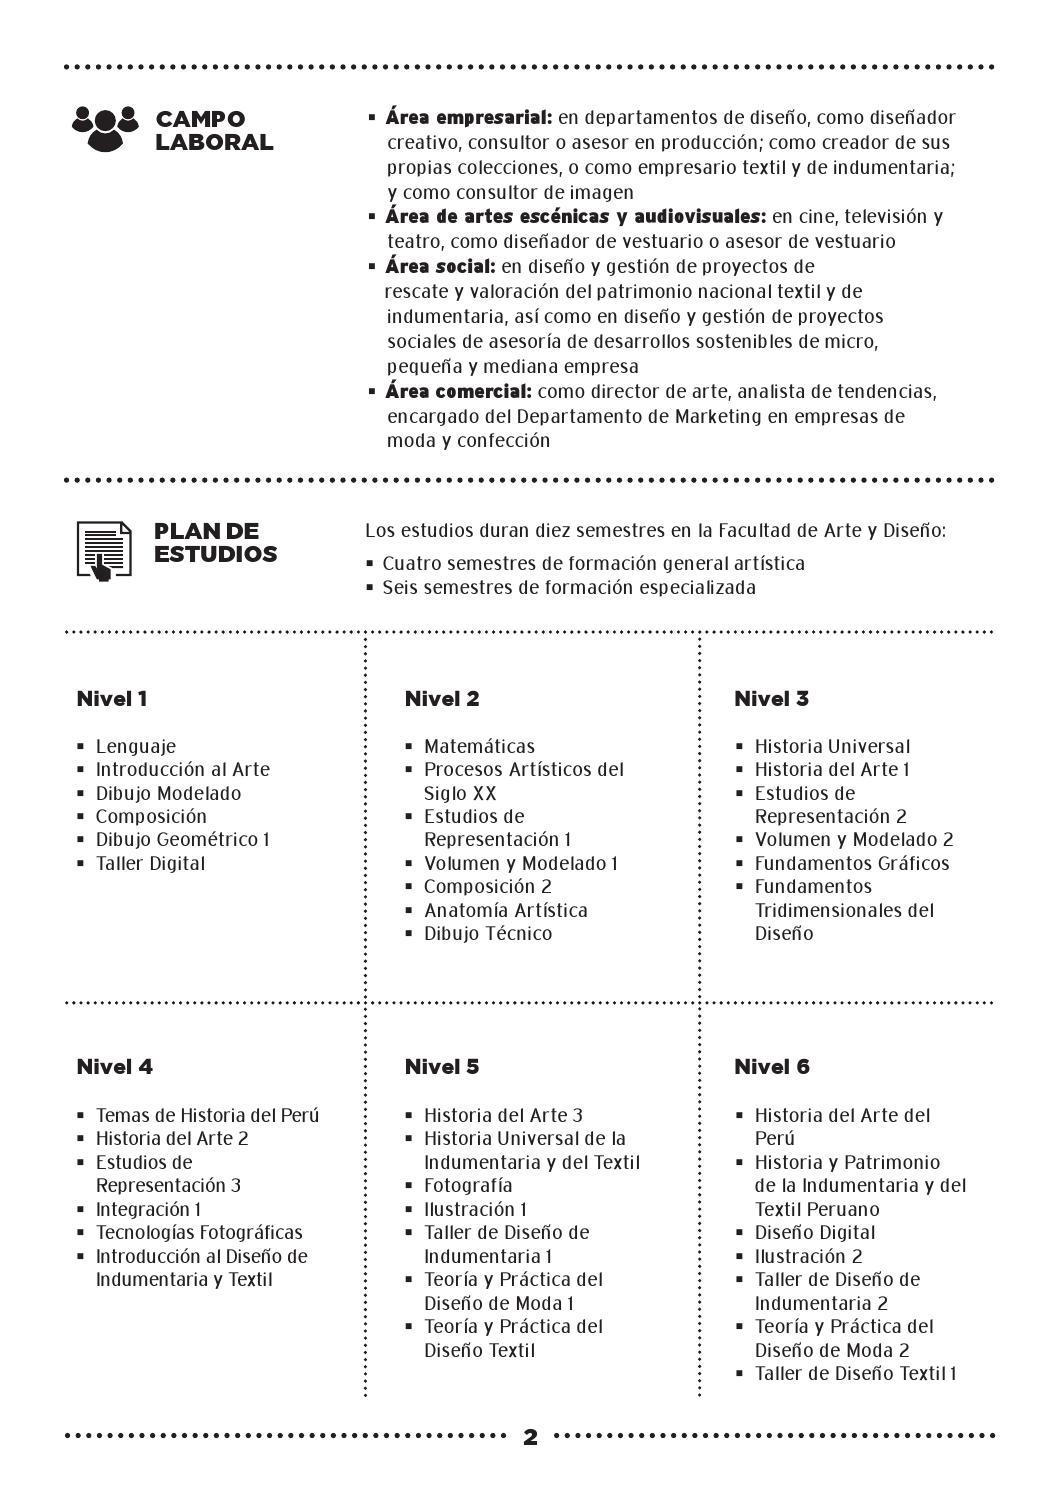 Arte, Moda y Diseño Textil by Zona Escolar PUCP - issuu